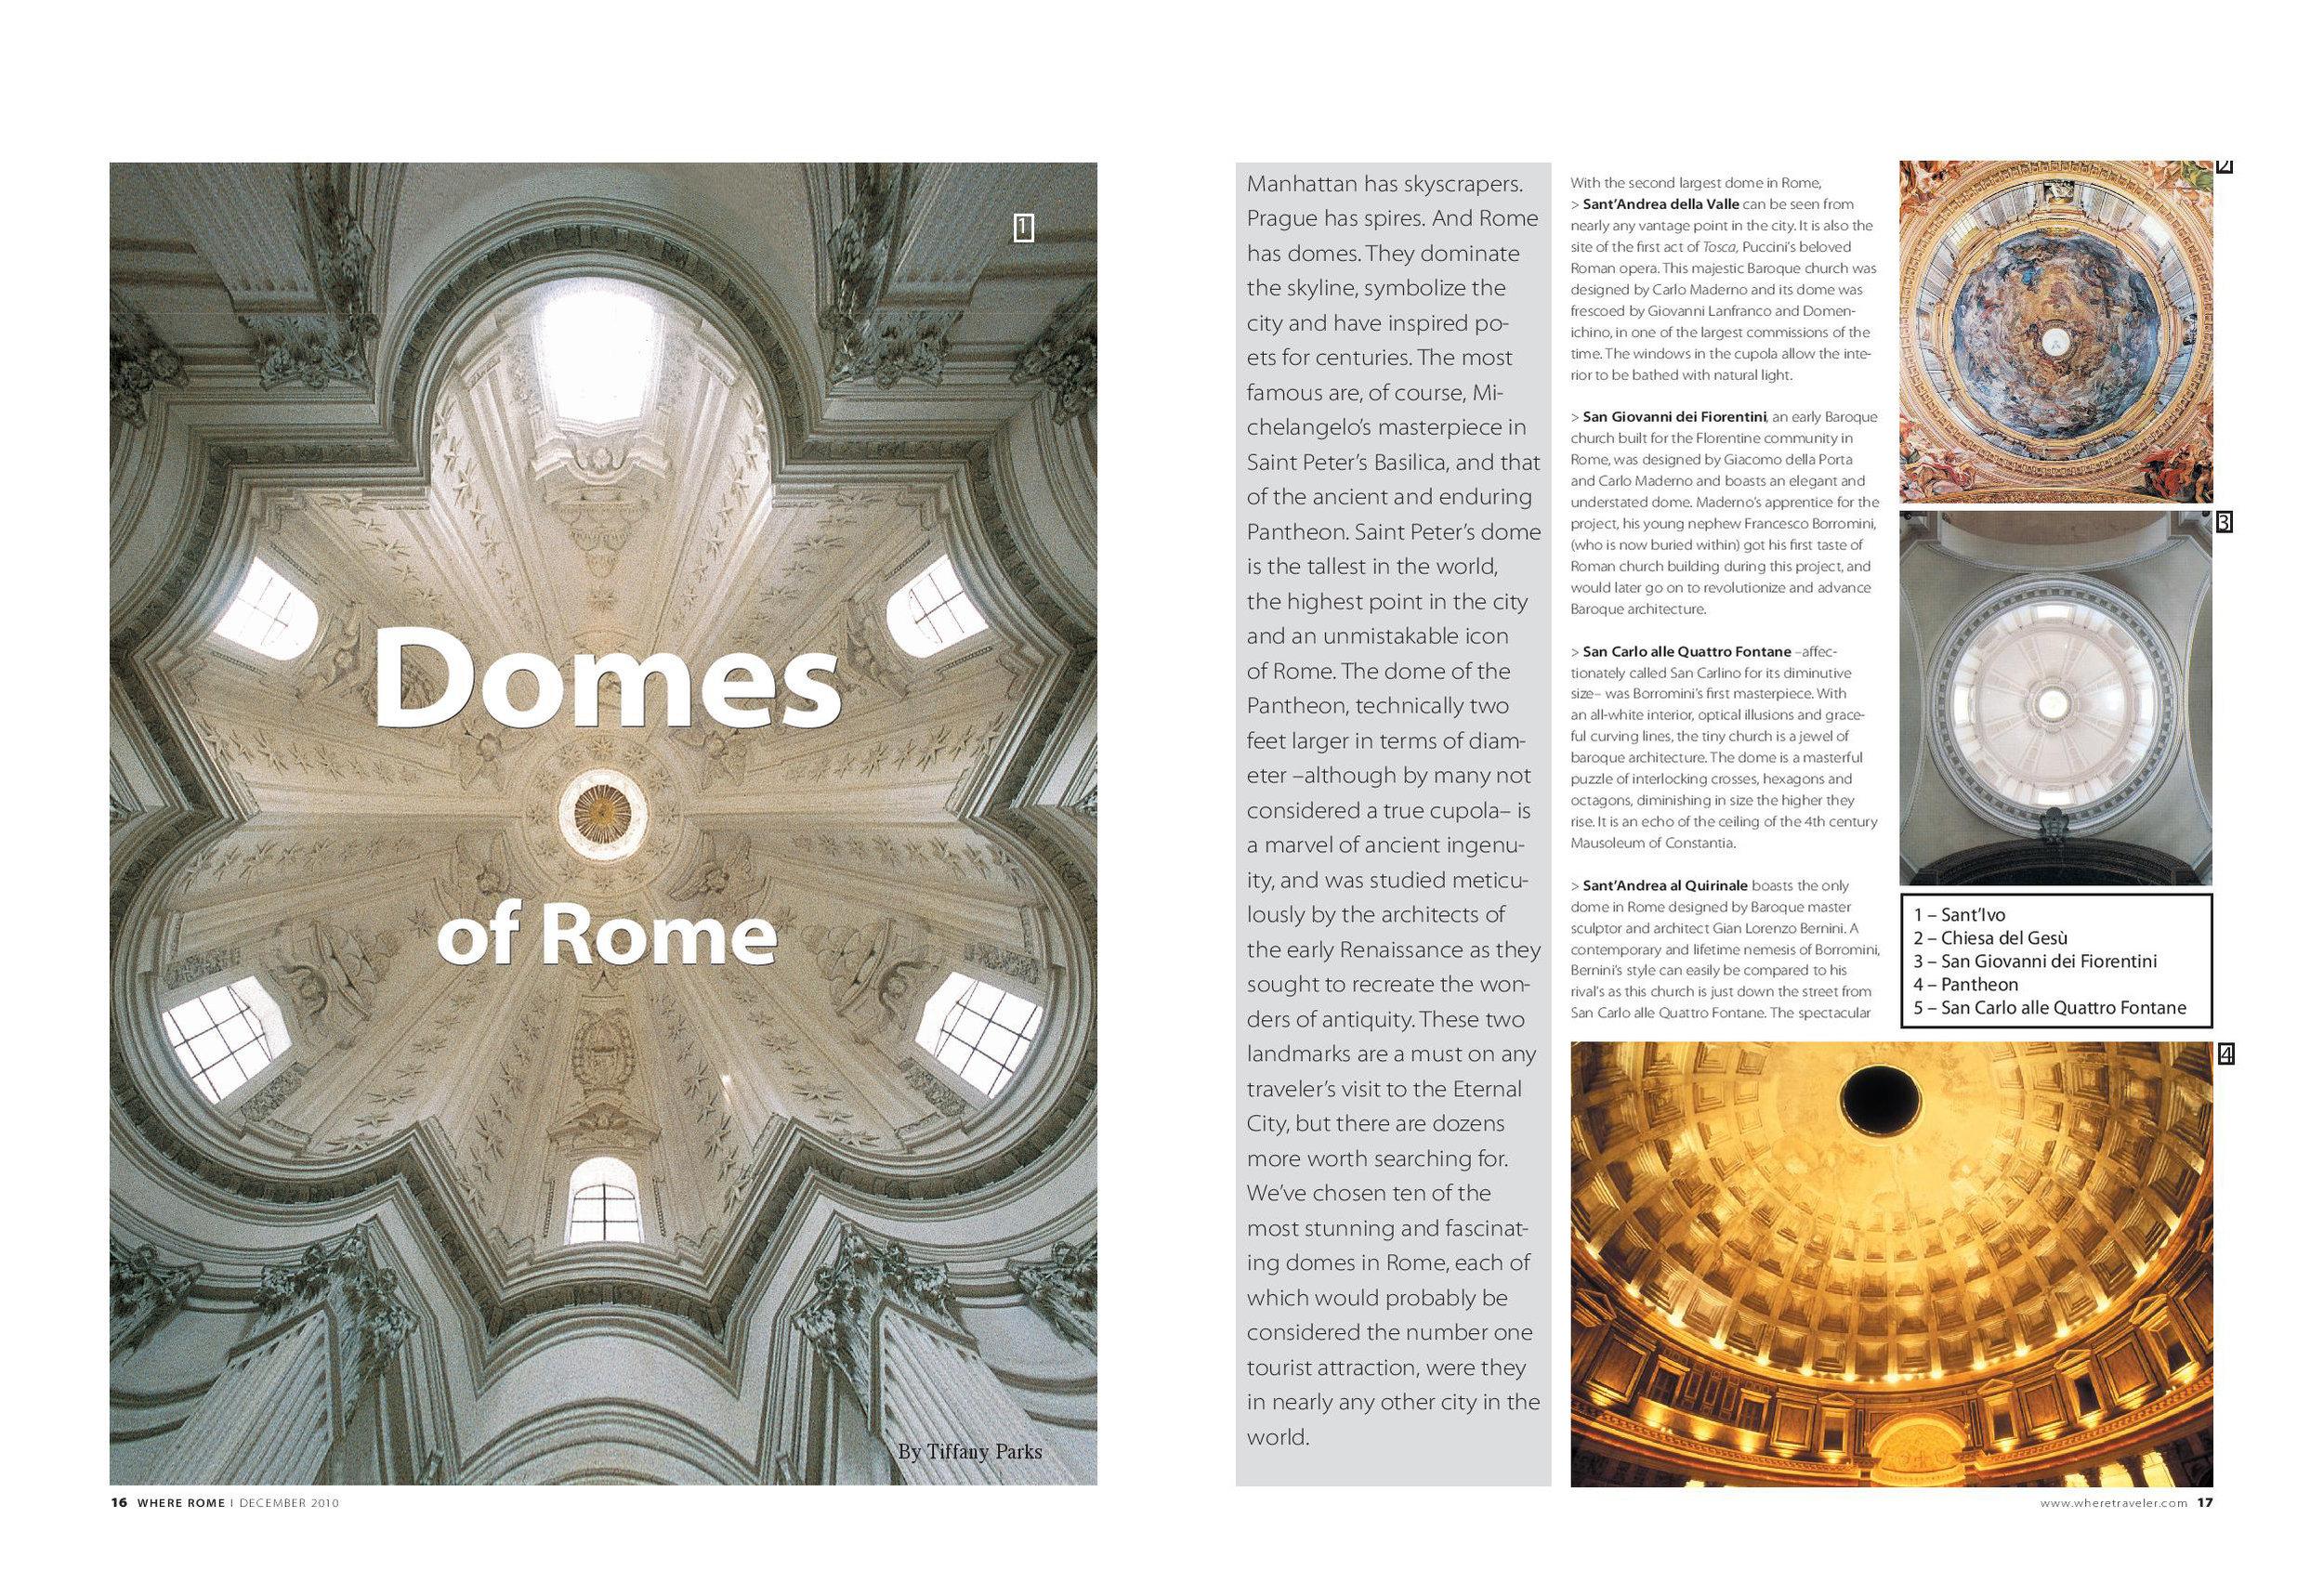 Domes-of-Rome-where-rome-dec-2010.jpg